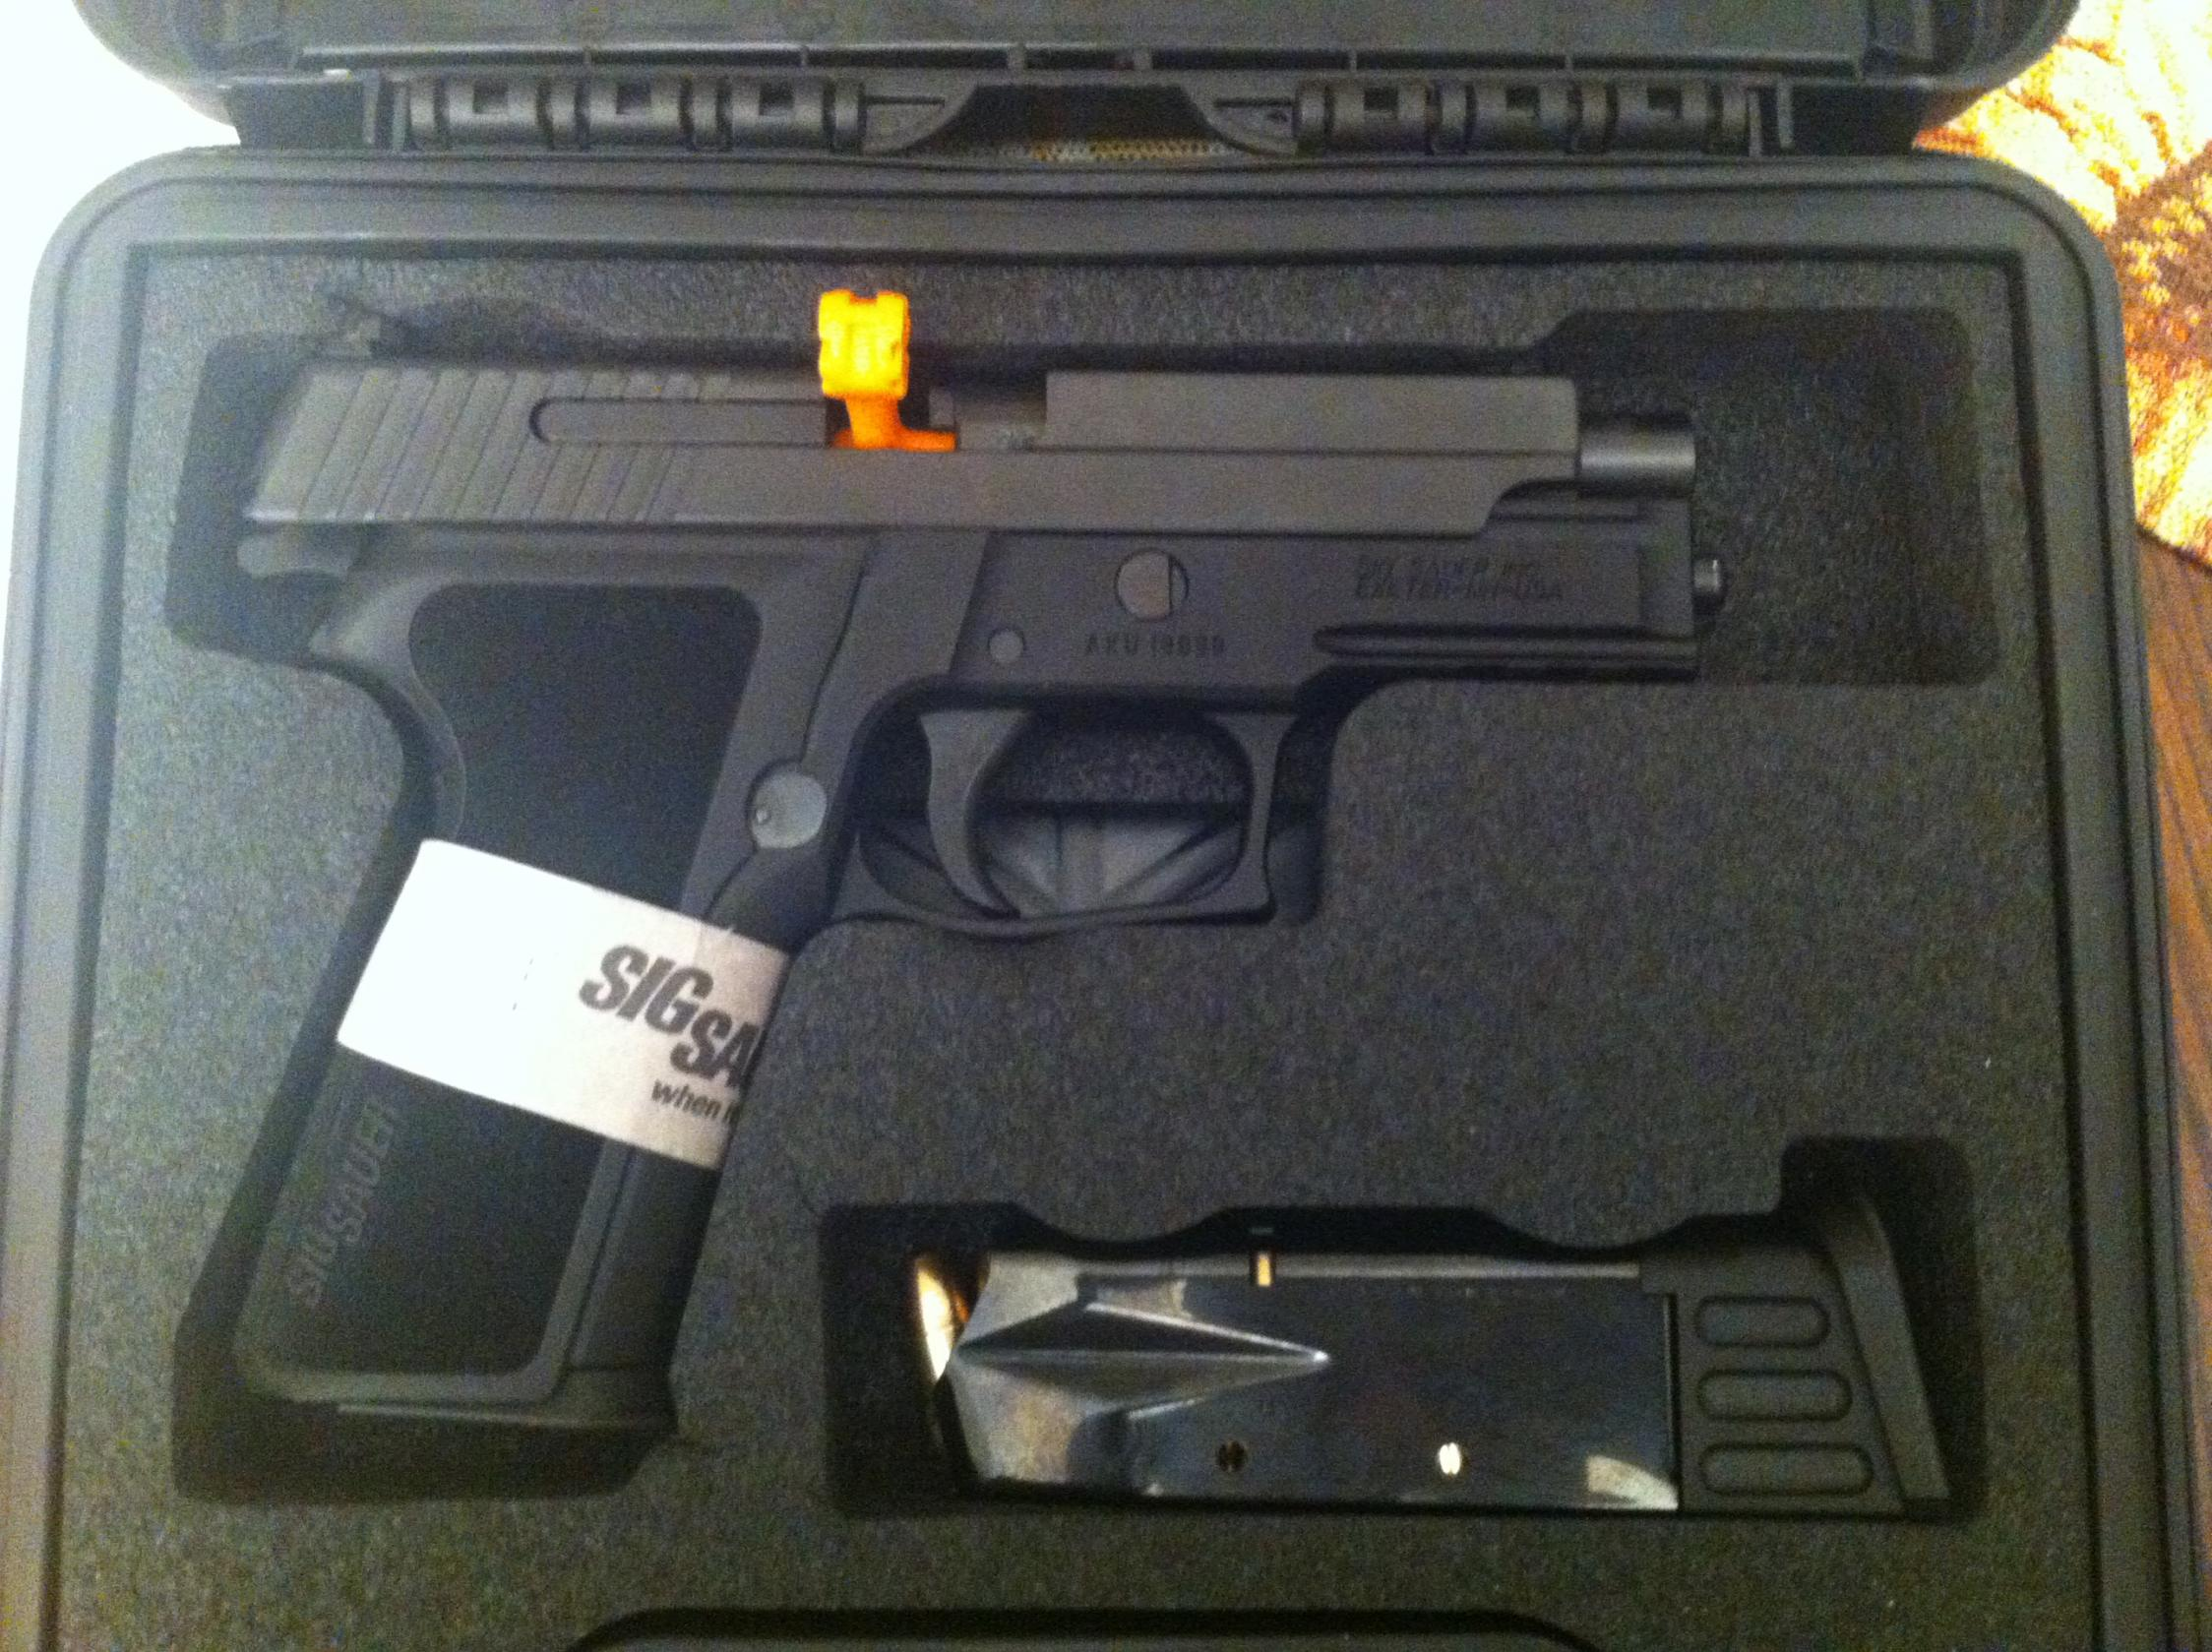 Range Report on my new Sig Sauer P229-img_4536.jpg